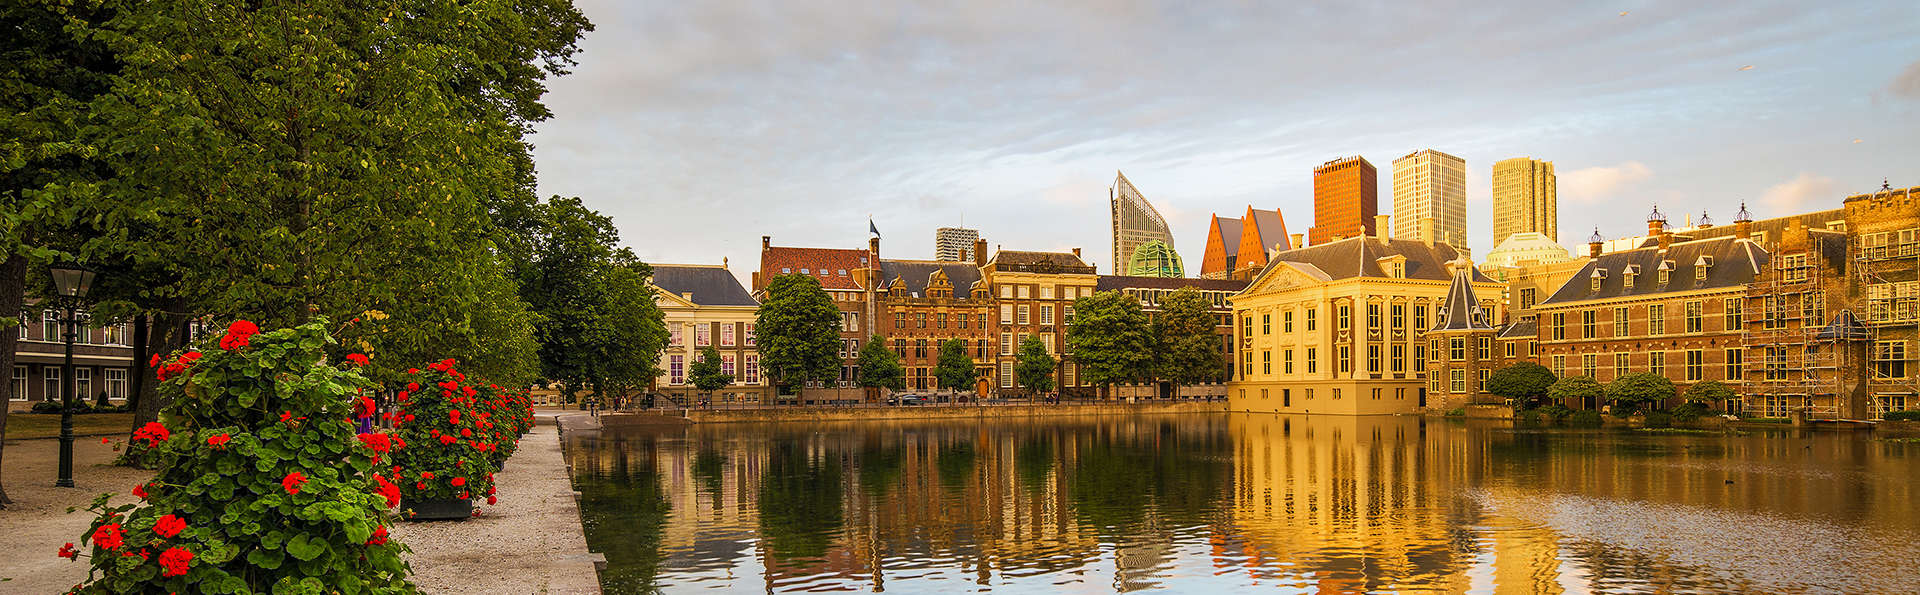 Hotel Mozaic Den Haag - EDIT_Destination_The_Hague2.jpg